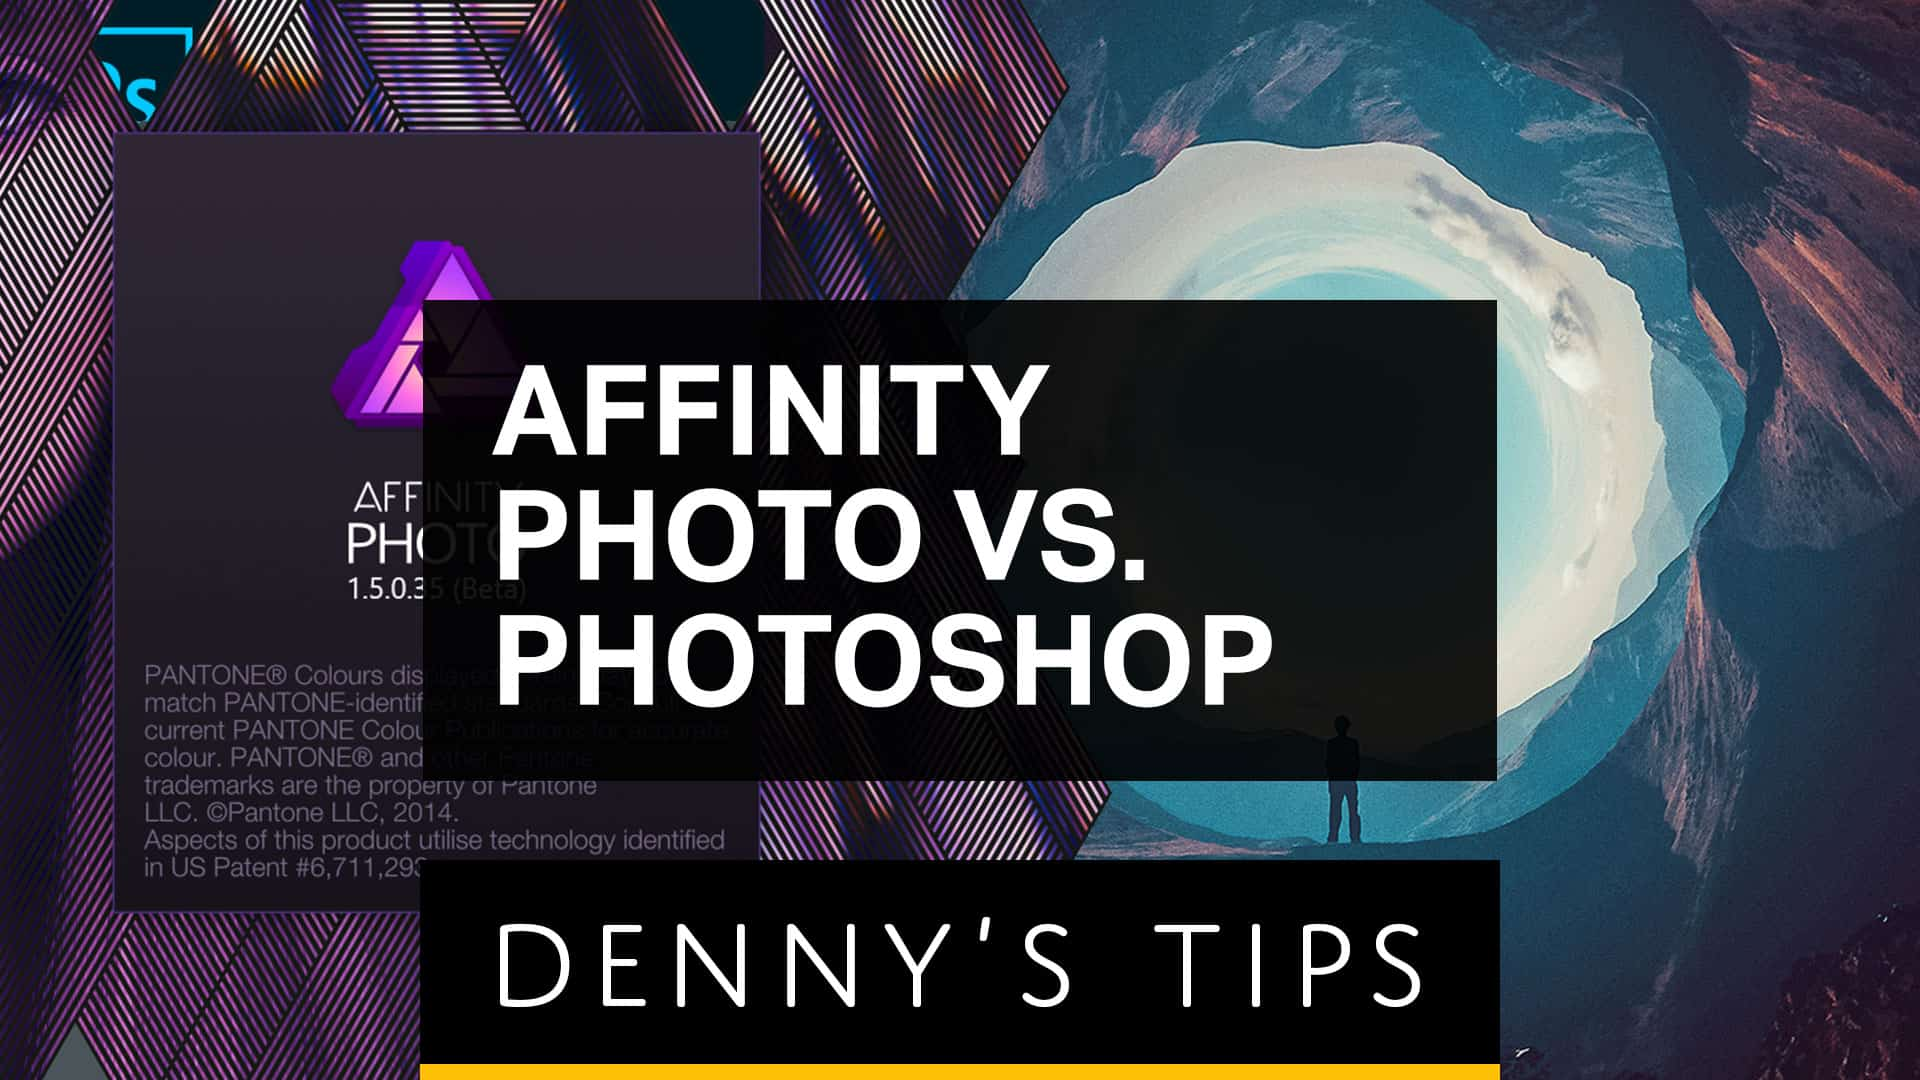 Affinity Photo vs Photoshop - Worth the Switch?